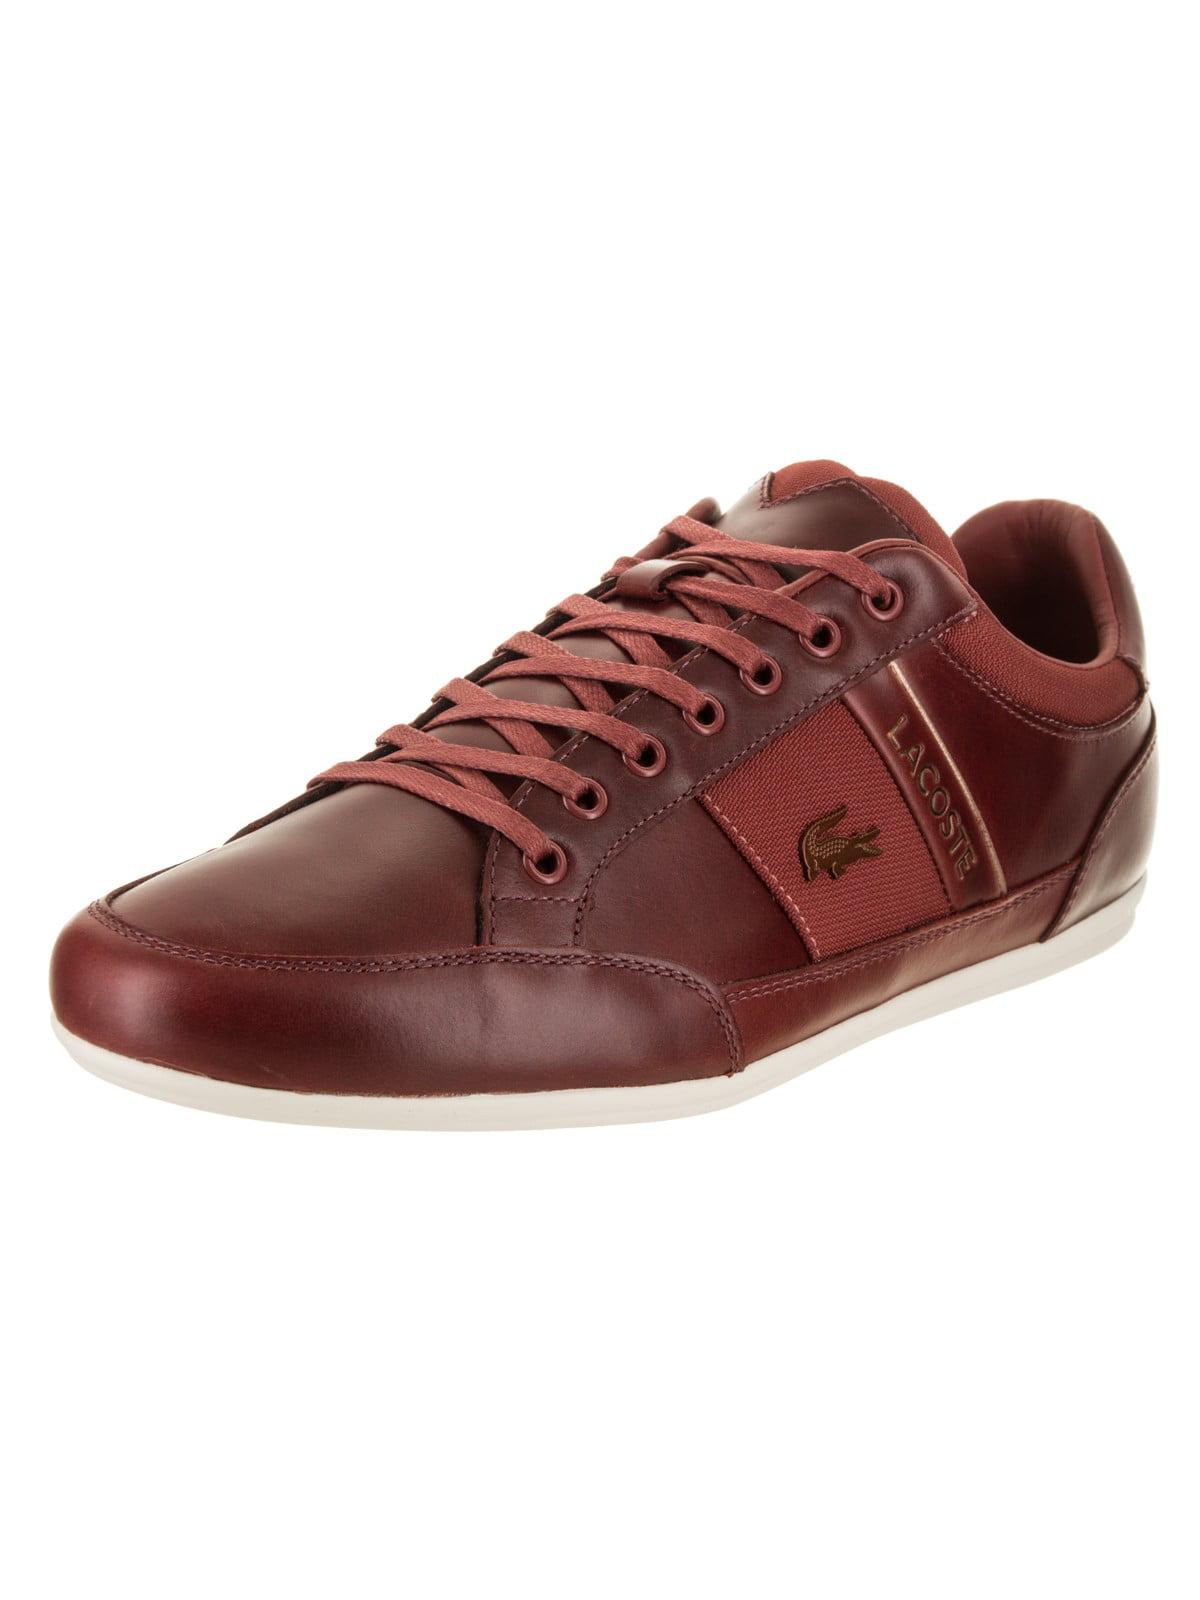 Lacoste Men's Chaymon 318 7 U CAM Casual Shoe